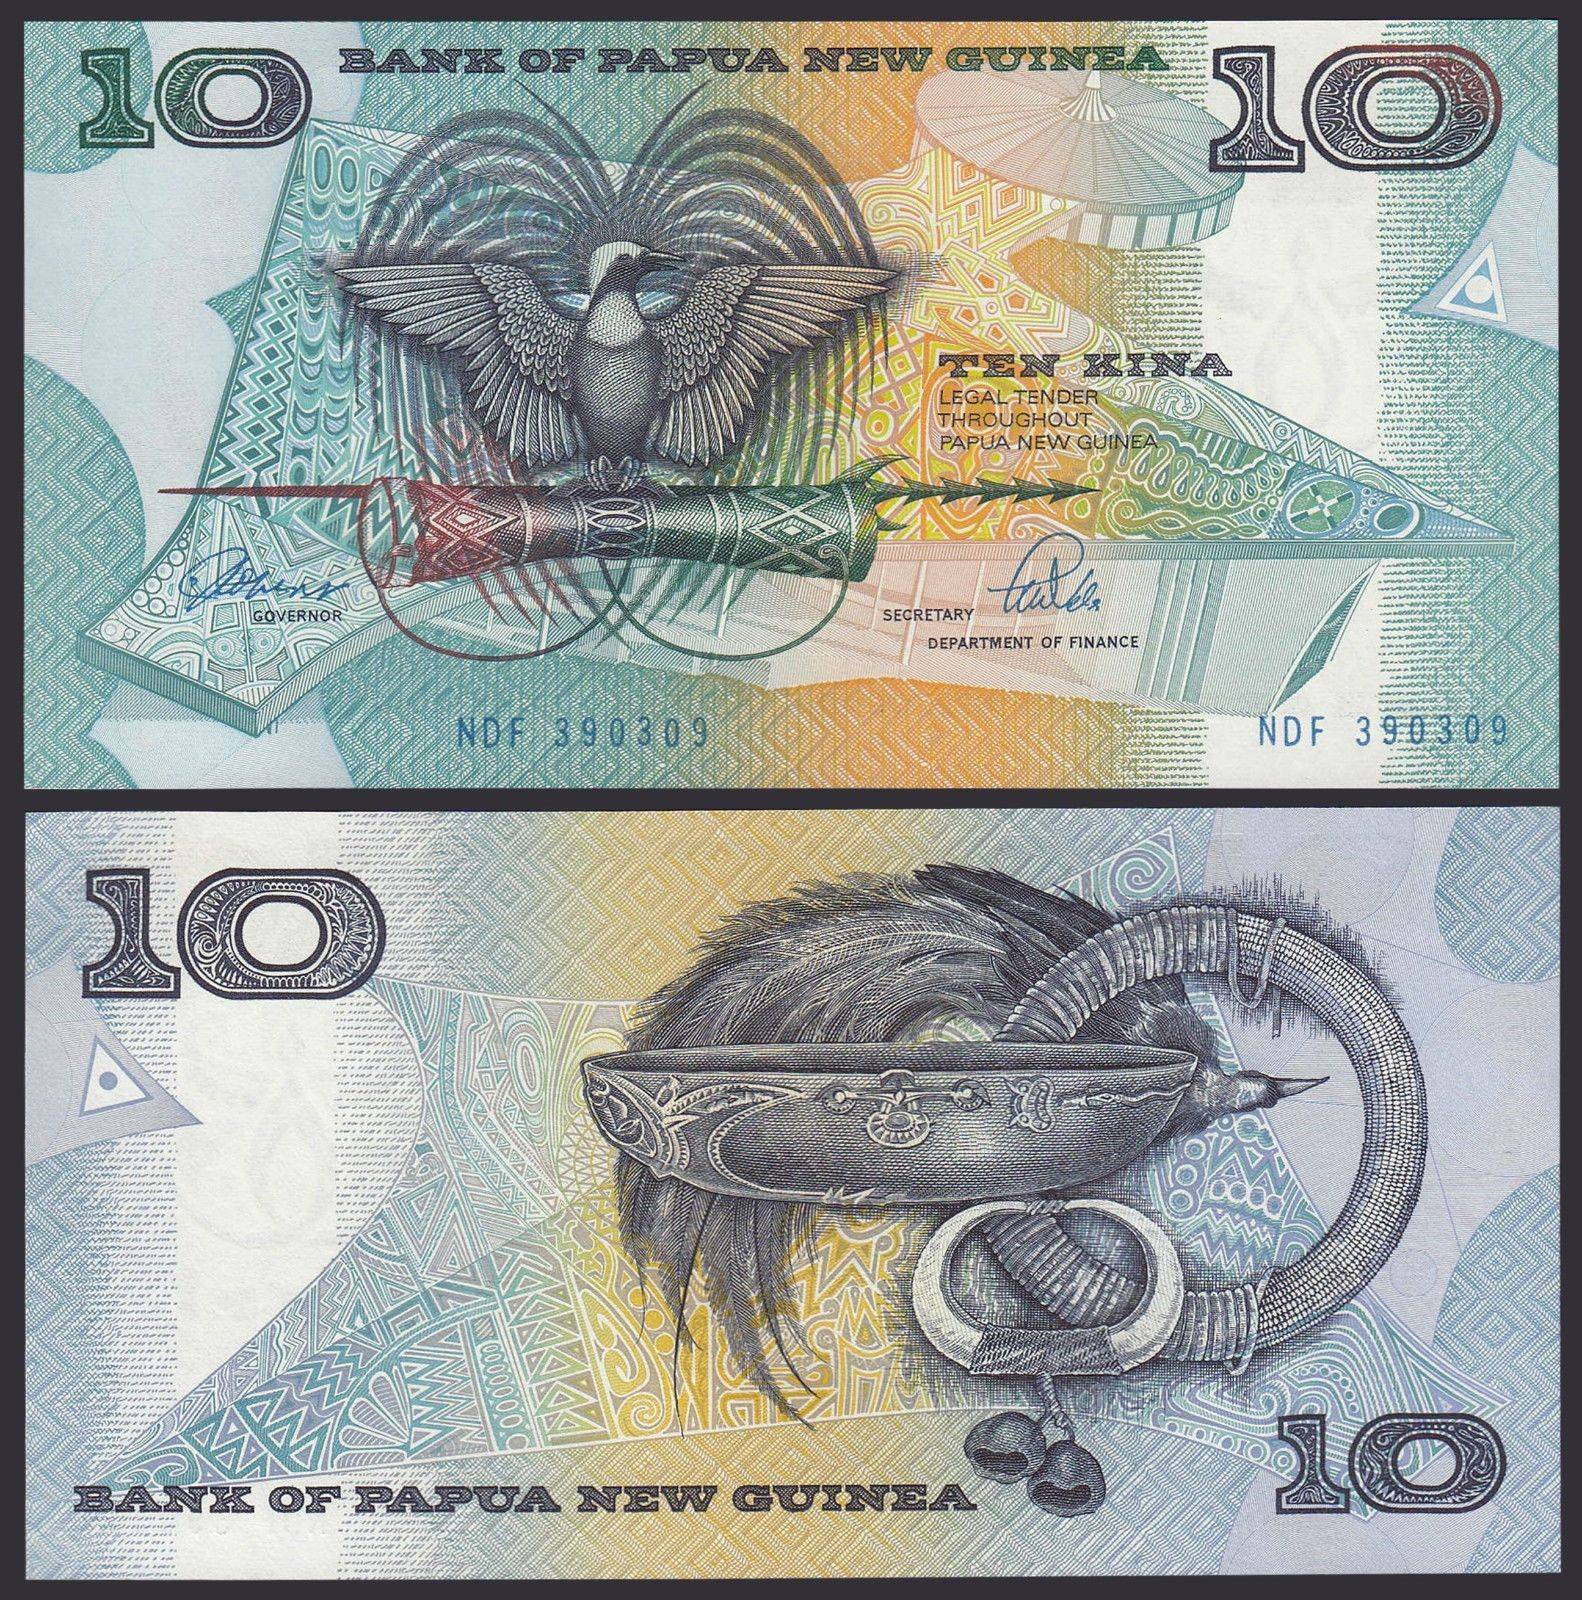 Pick 9 UNC 9b 1988 PAPUA NEW GUINEA,10 Kina ND